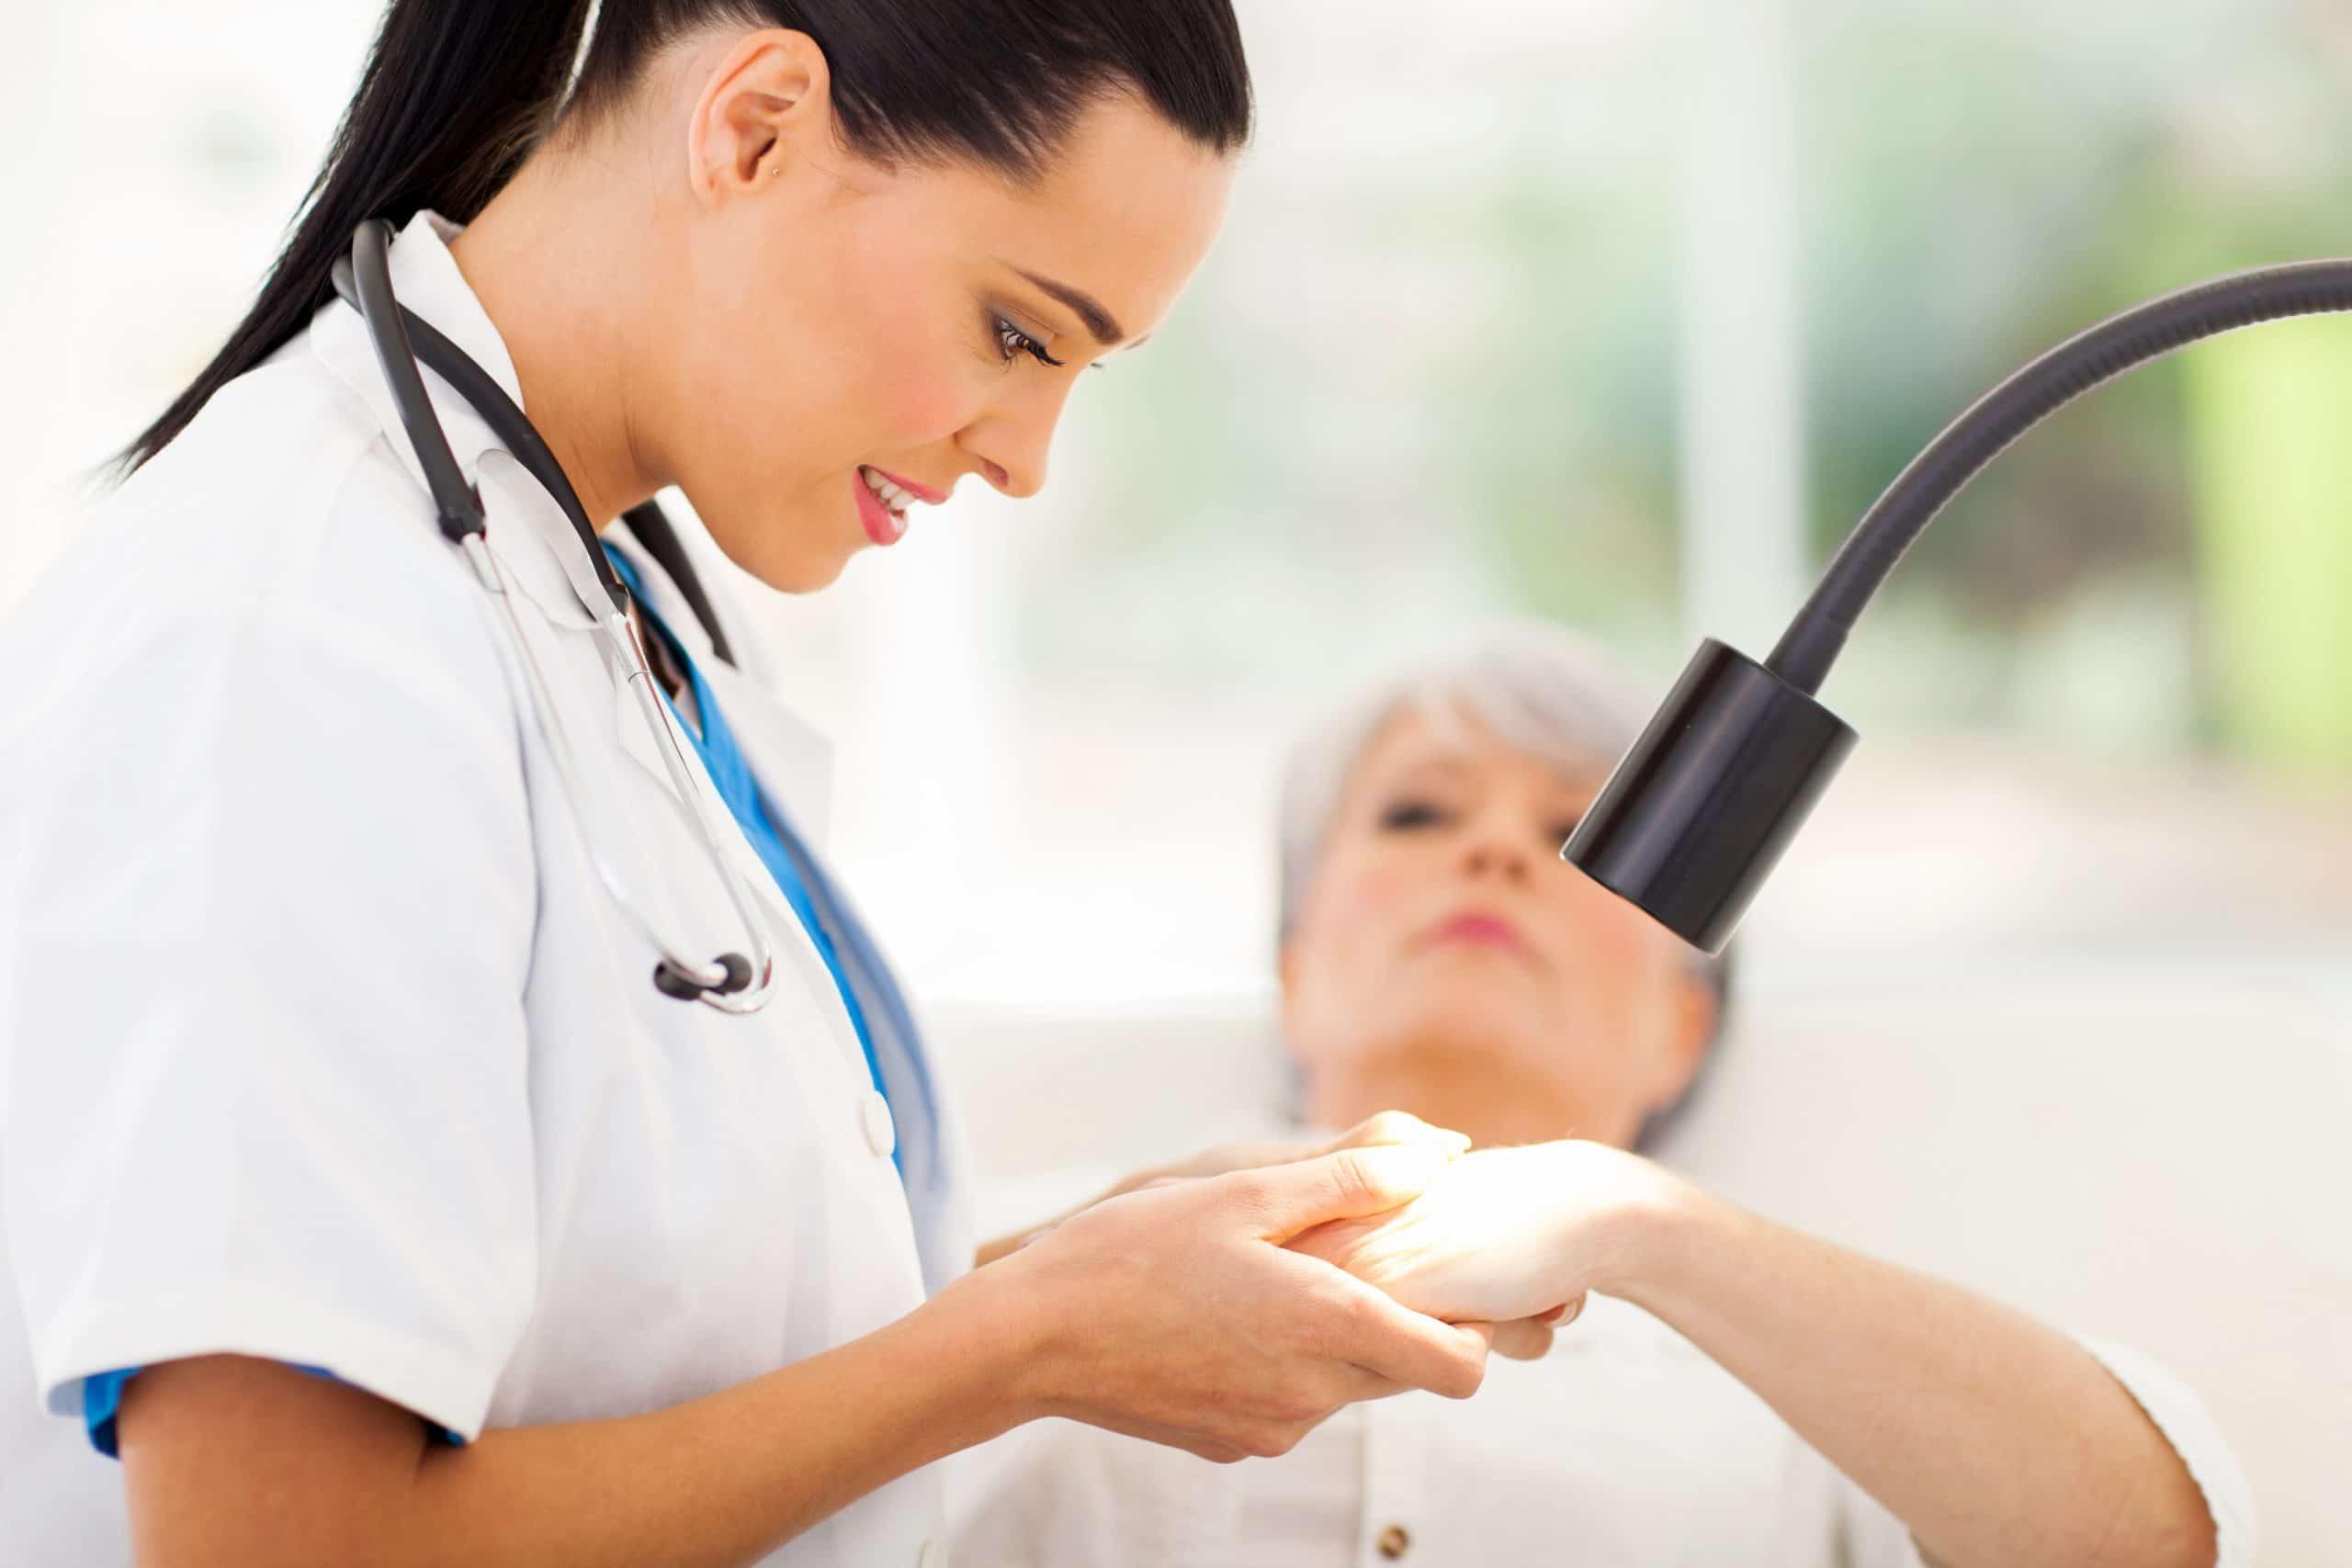 Arts of dermatoloog